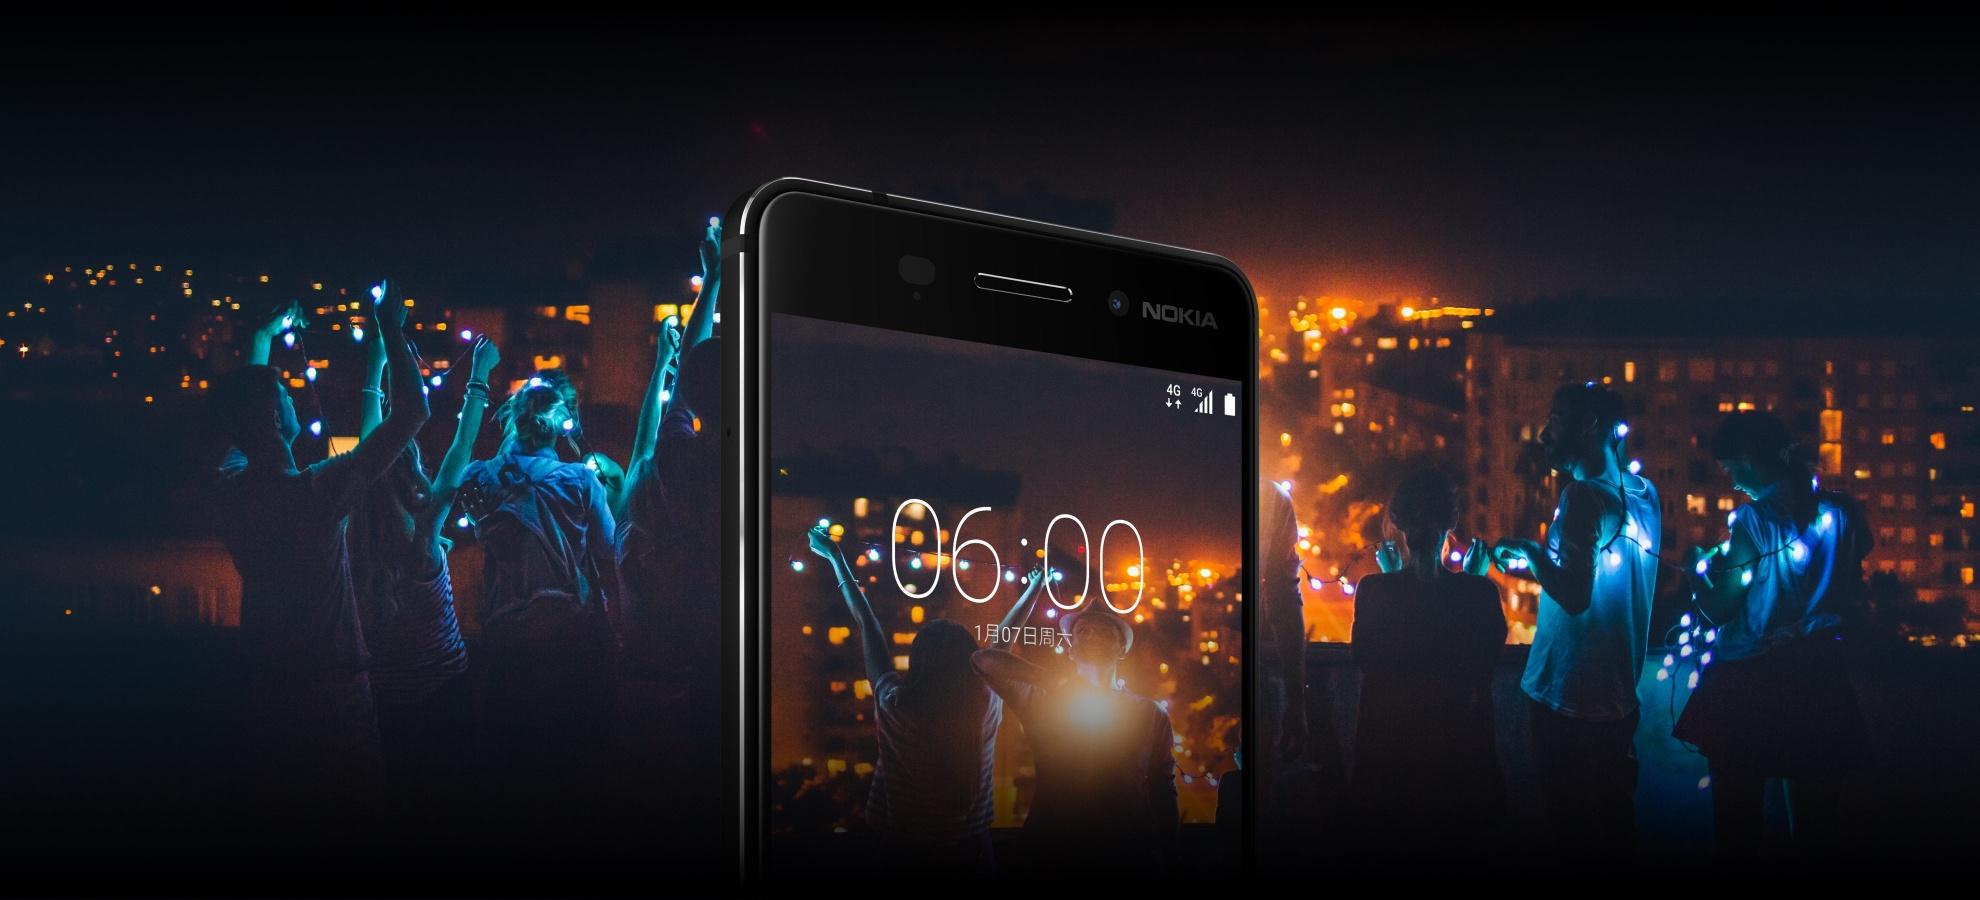 Nokia-6-Nokia-D1C